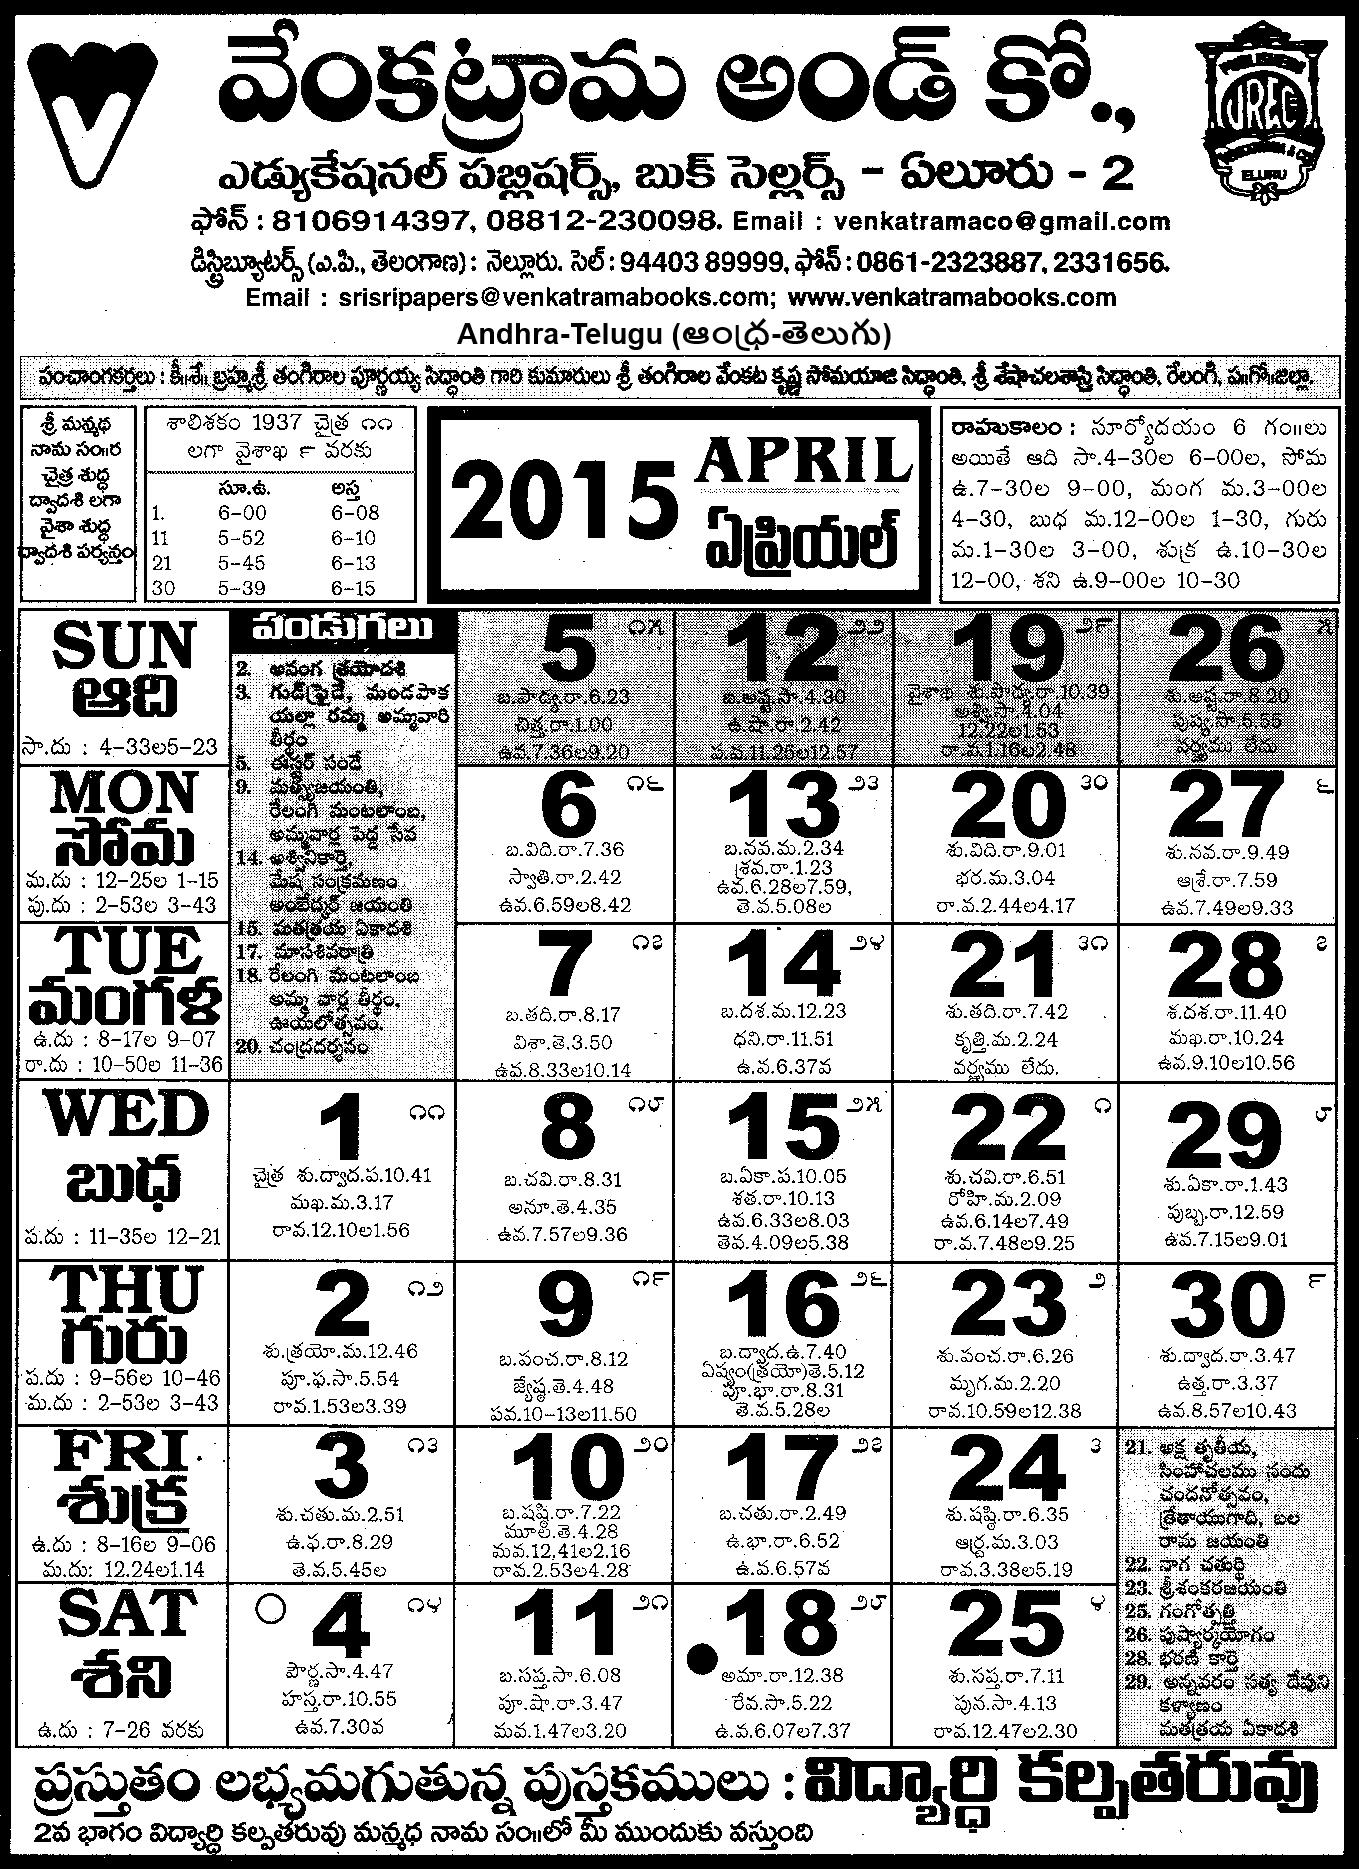 Venkatrama Telugu Calendar 2015